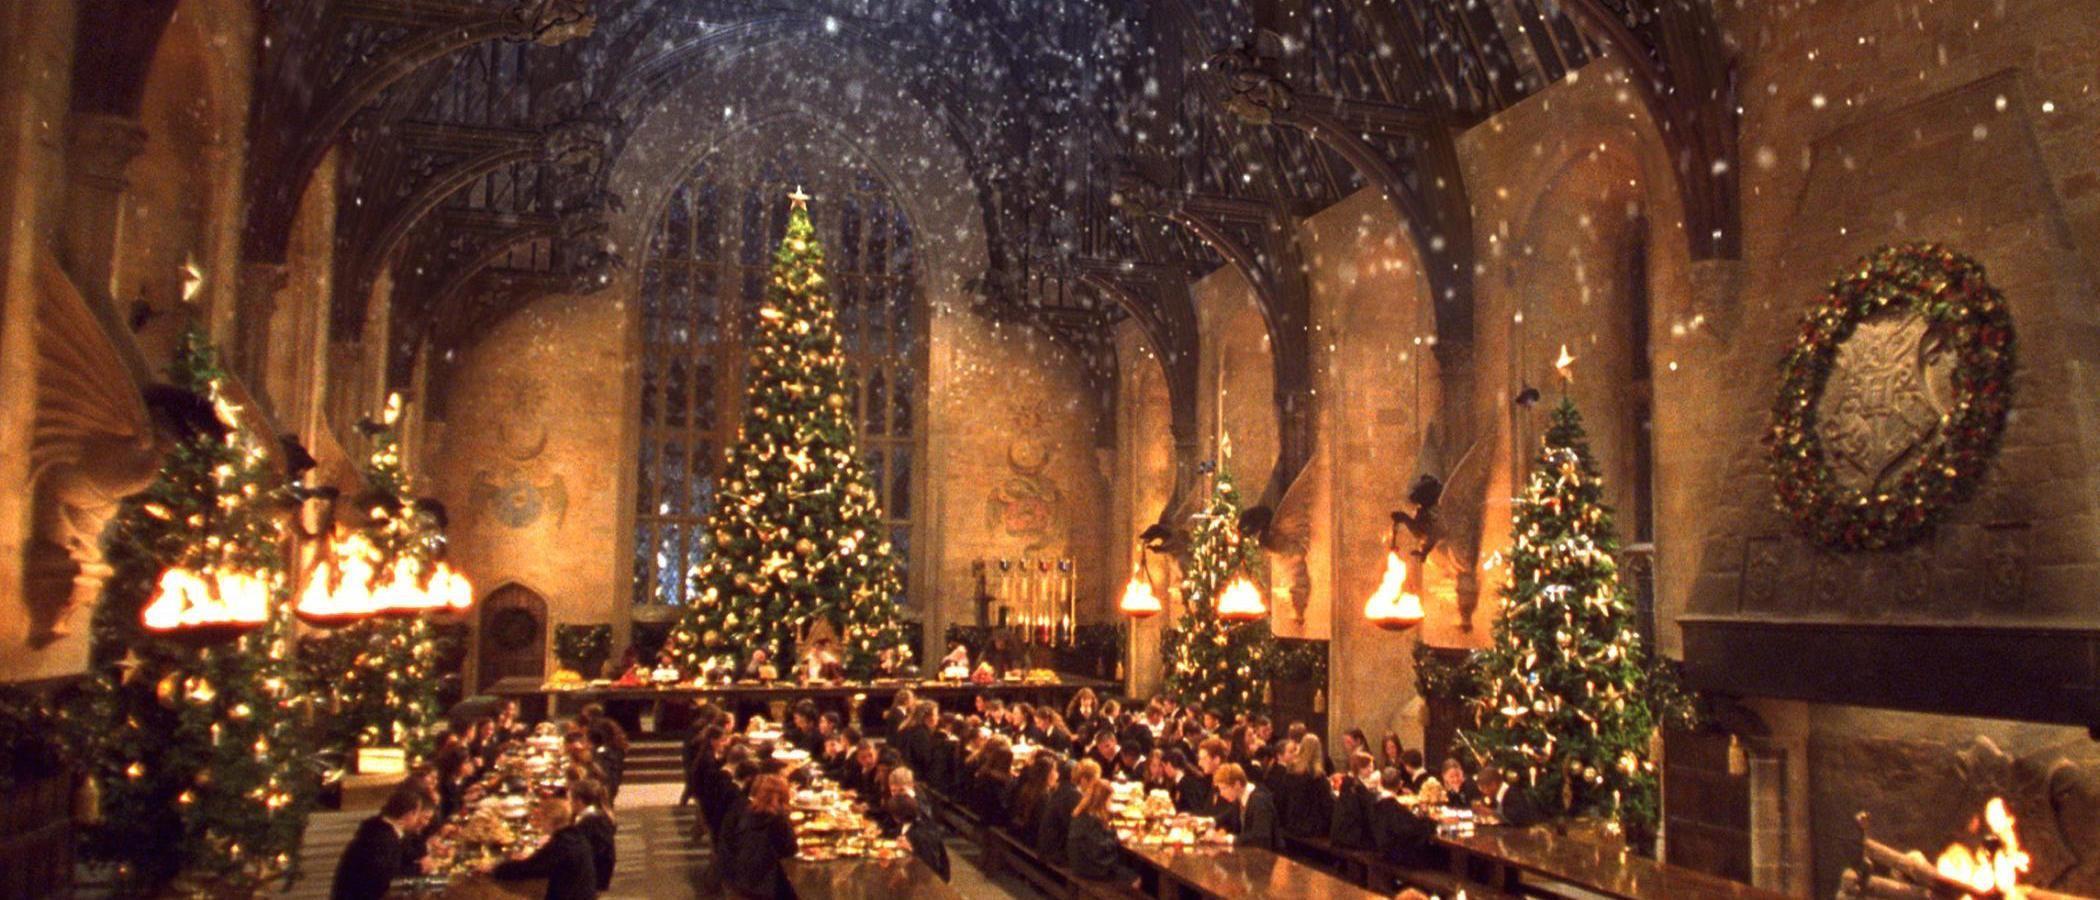 Cena de Navidad en Hogwarts